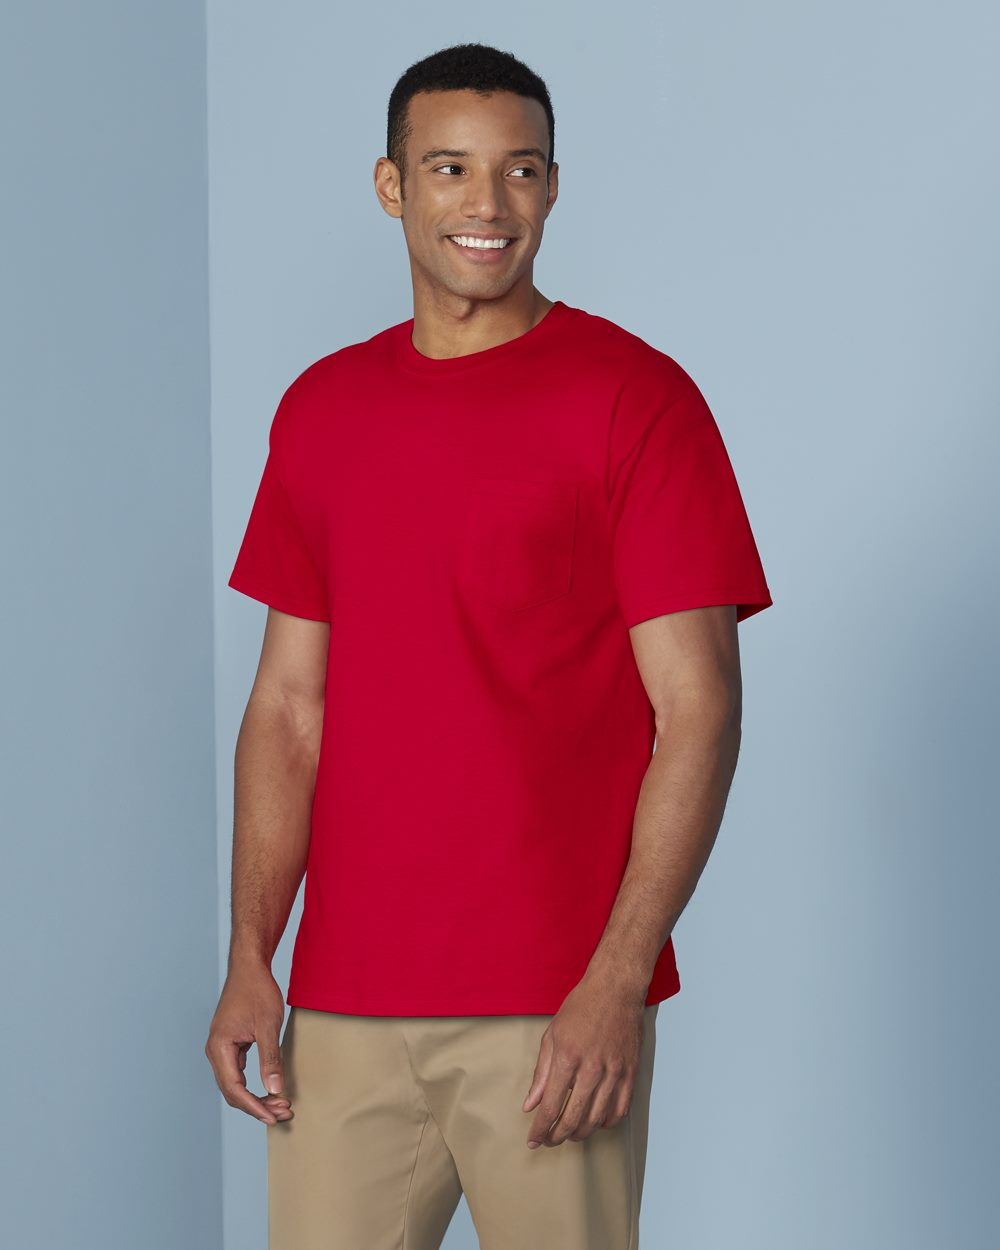 Gildan 5300 - Heavy Cotton T-Shirt with a Pocket